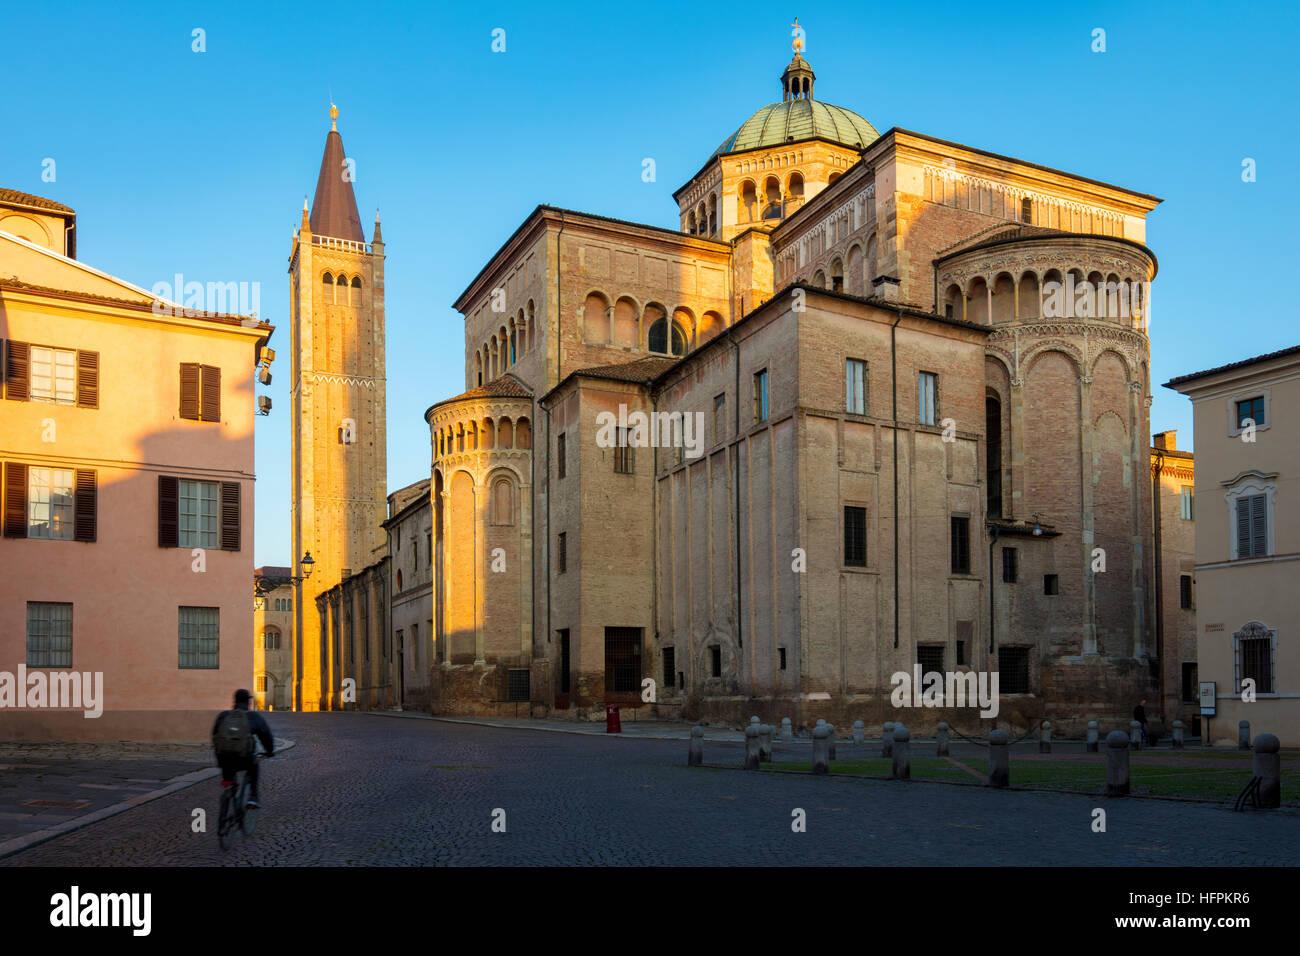 Sunrise over the Duomo, Parma, Emilia-Romagna, Italy - Stock Image